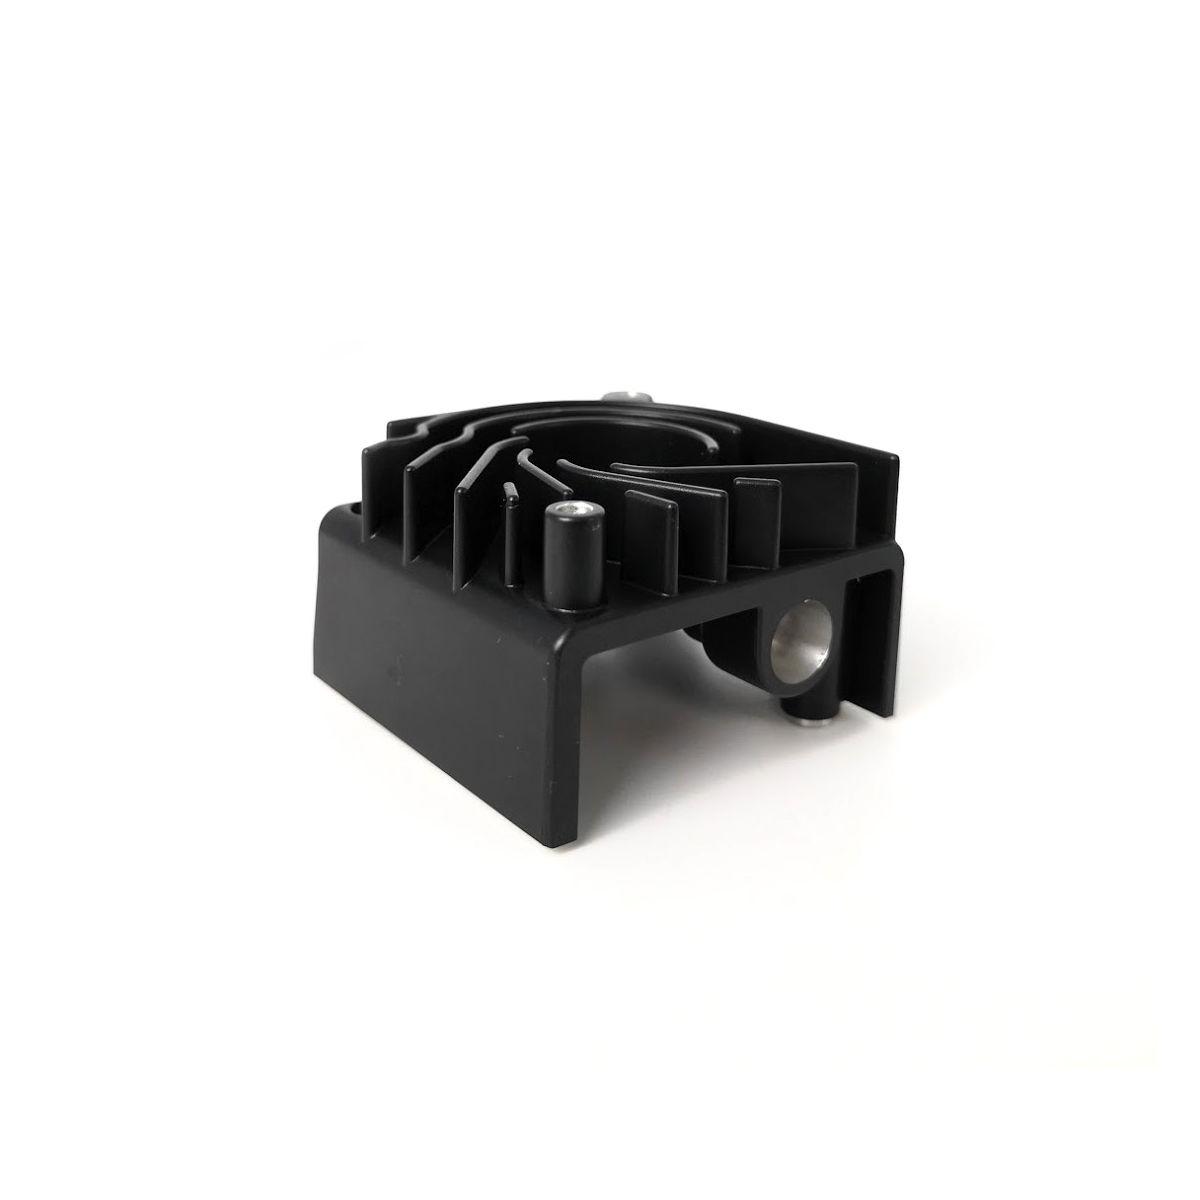 E3D Hermes Heatsinkt - 3D Printing Canada